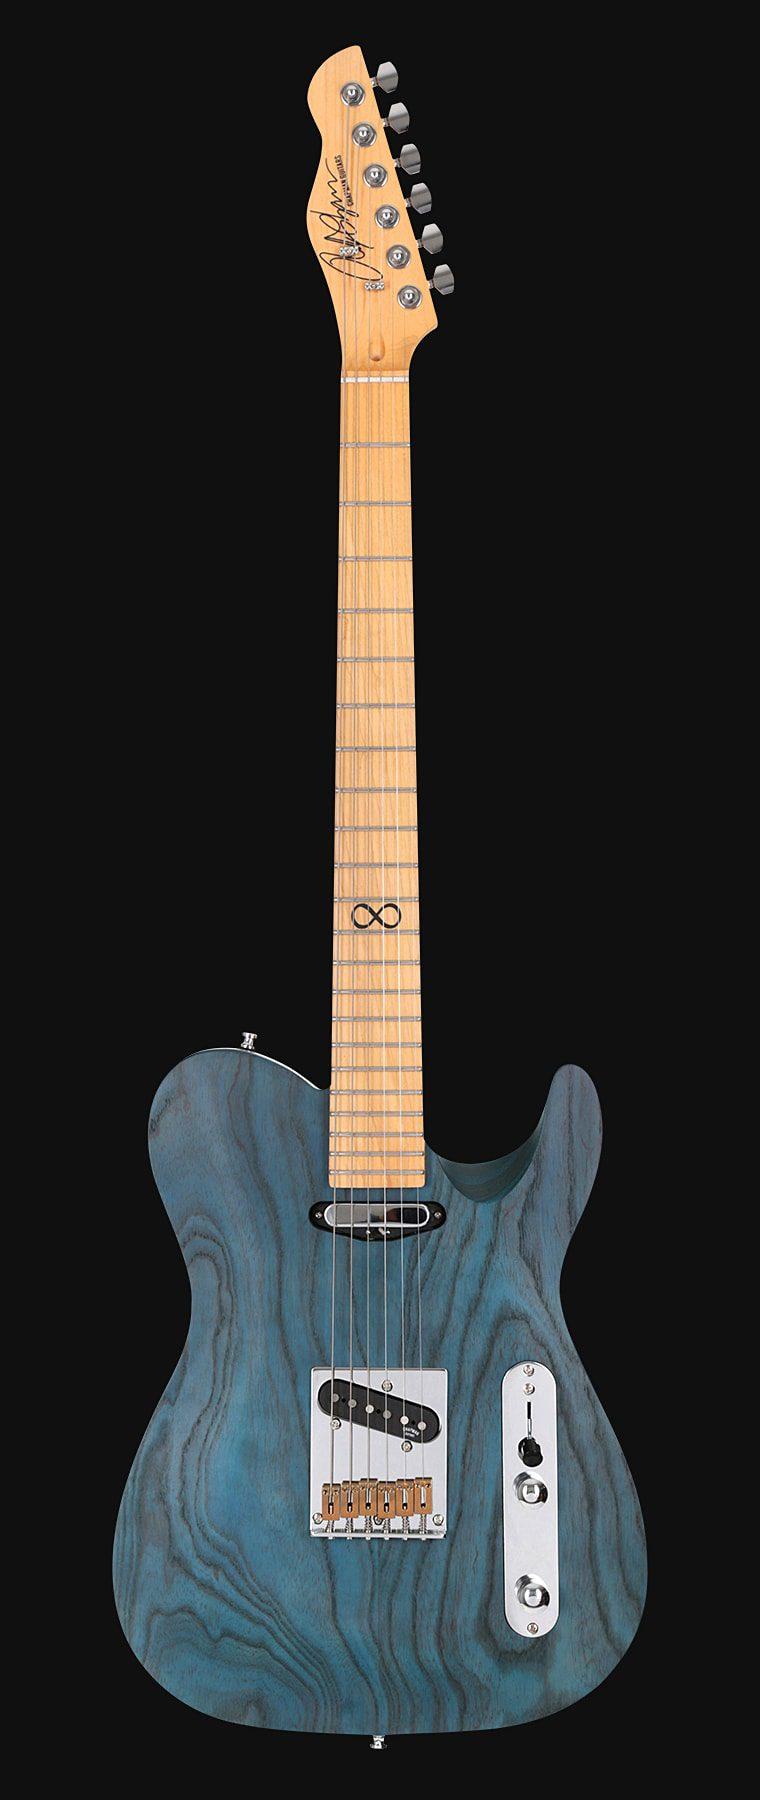 ml3 pro guitar